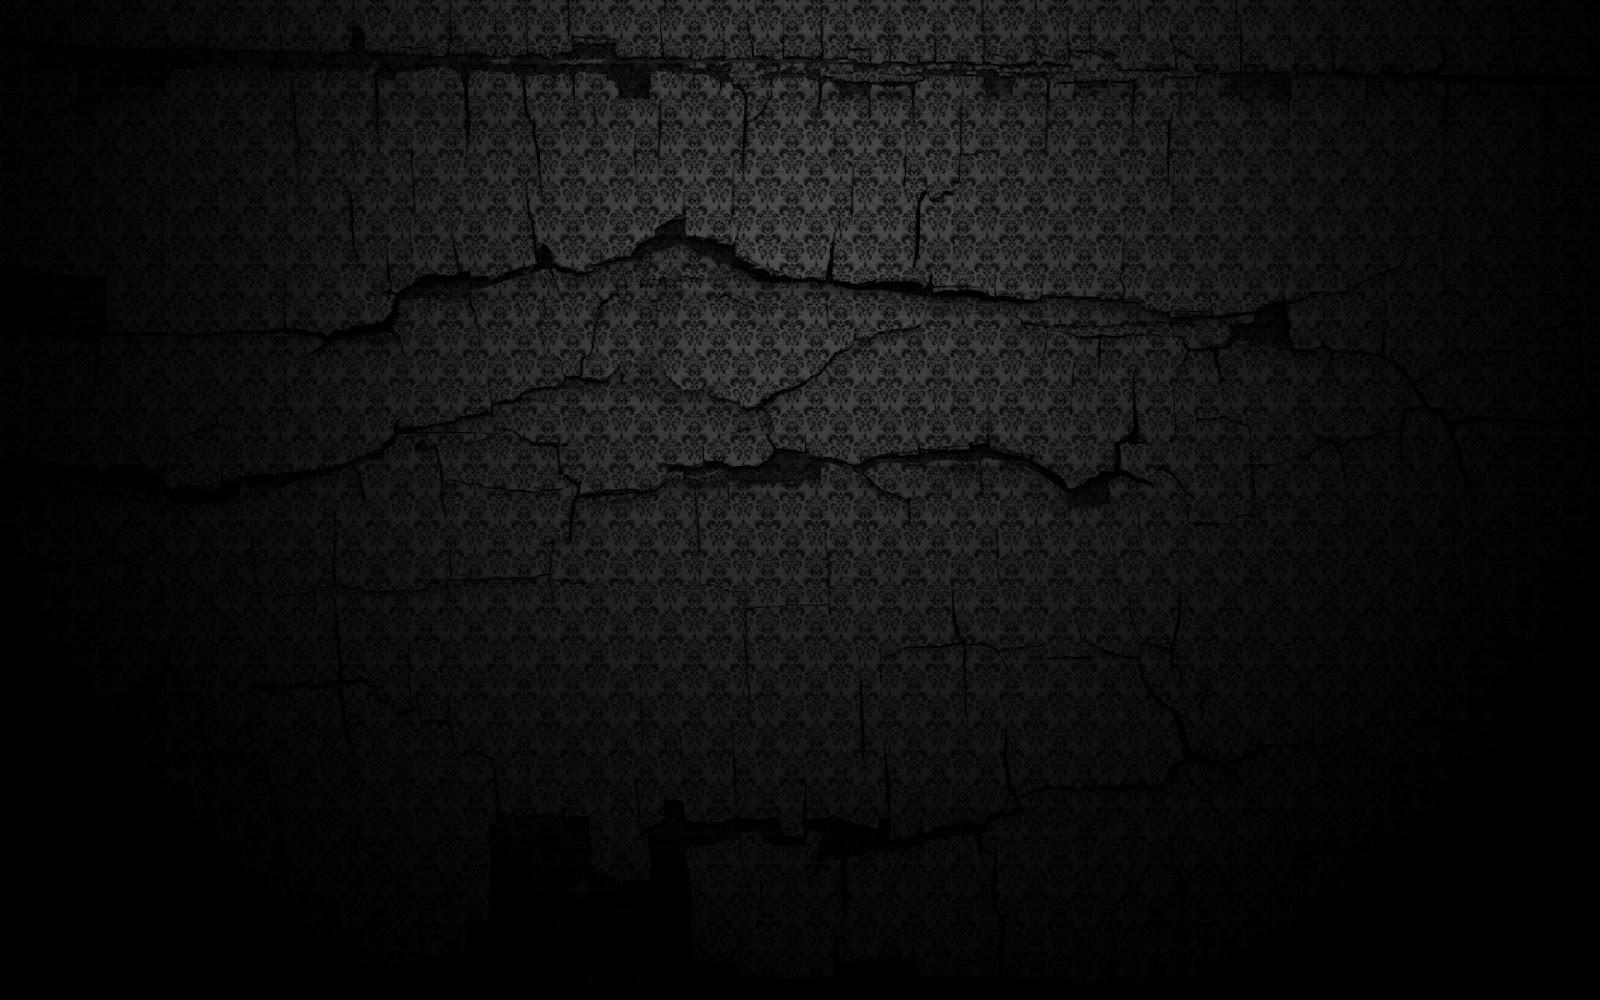 Central Wallpaper: Dark Patterns HD Wallpapers